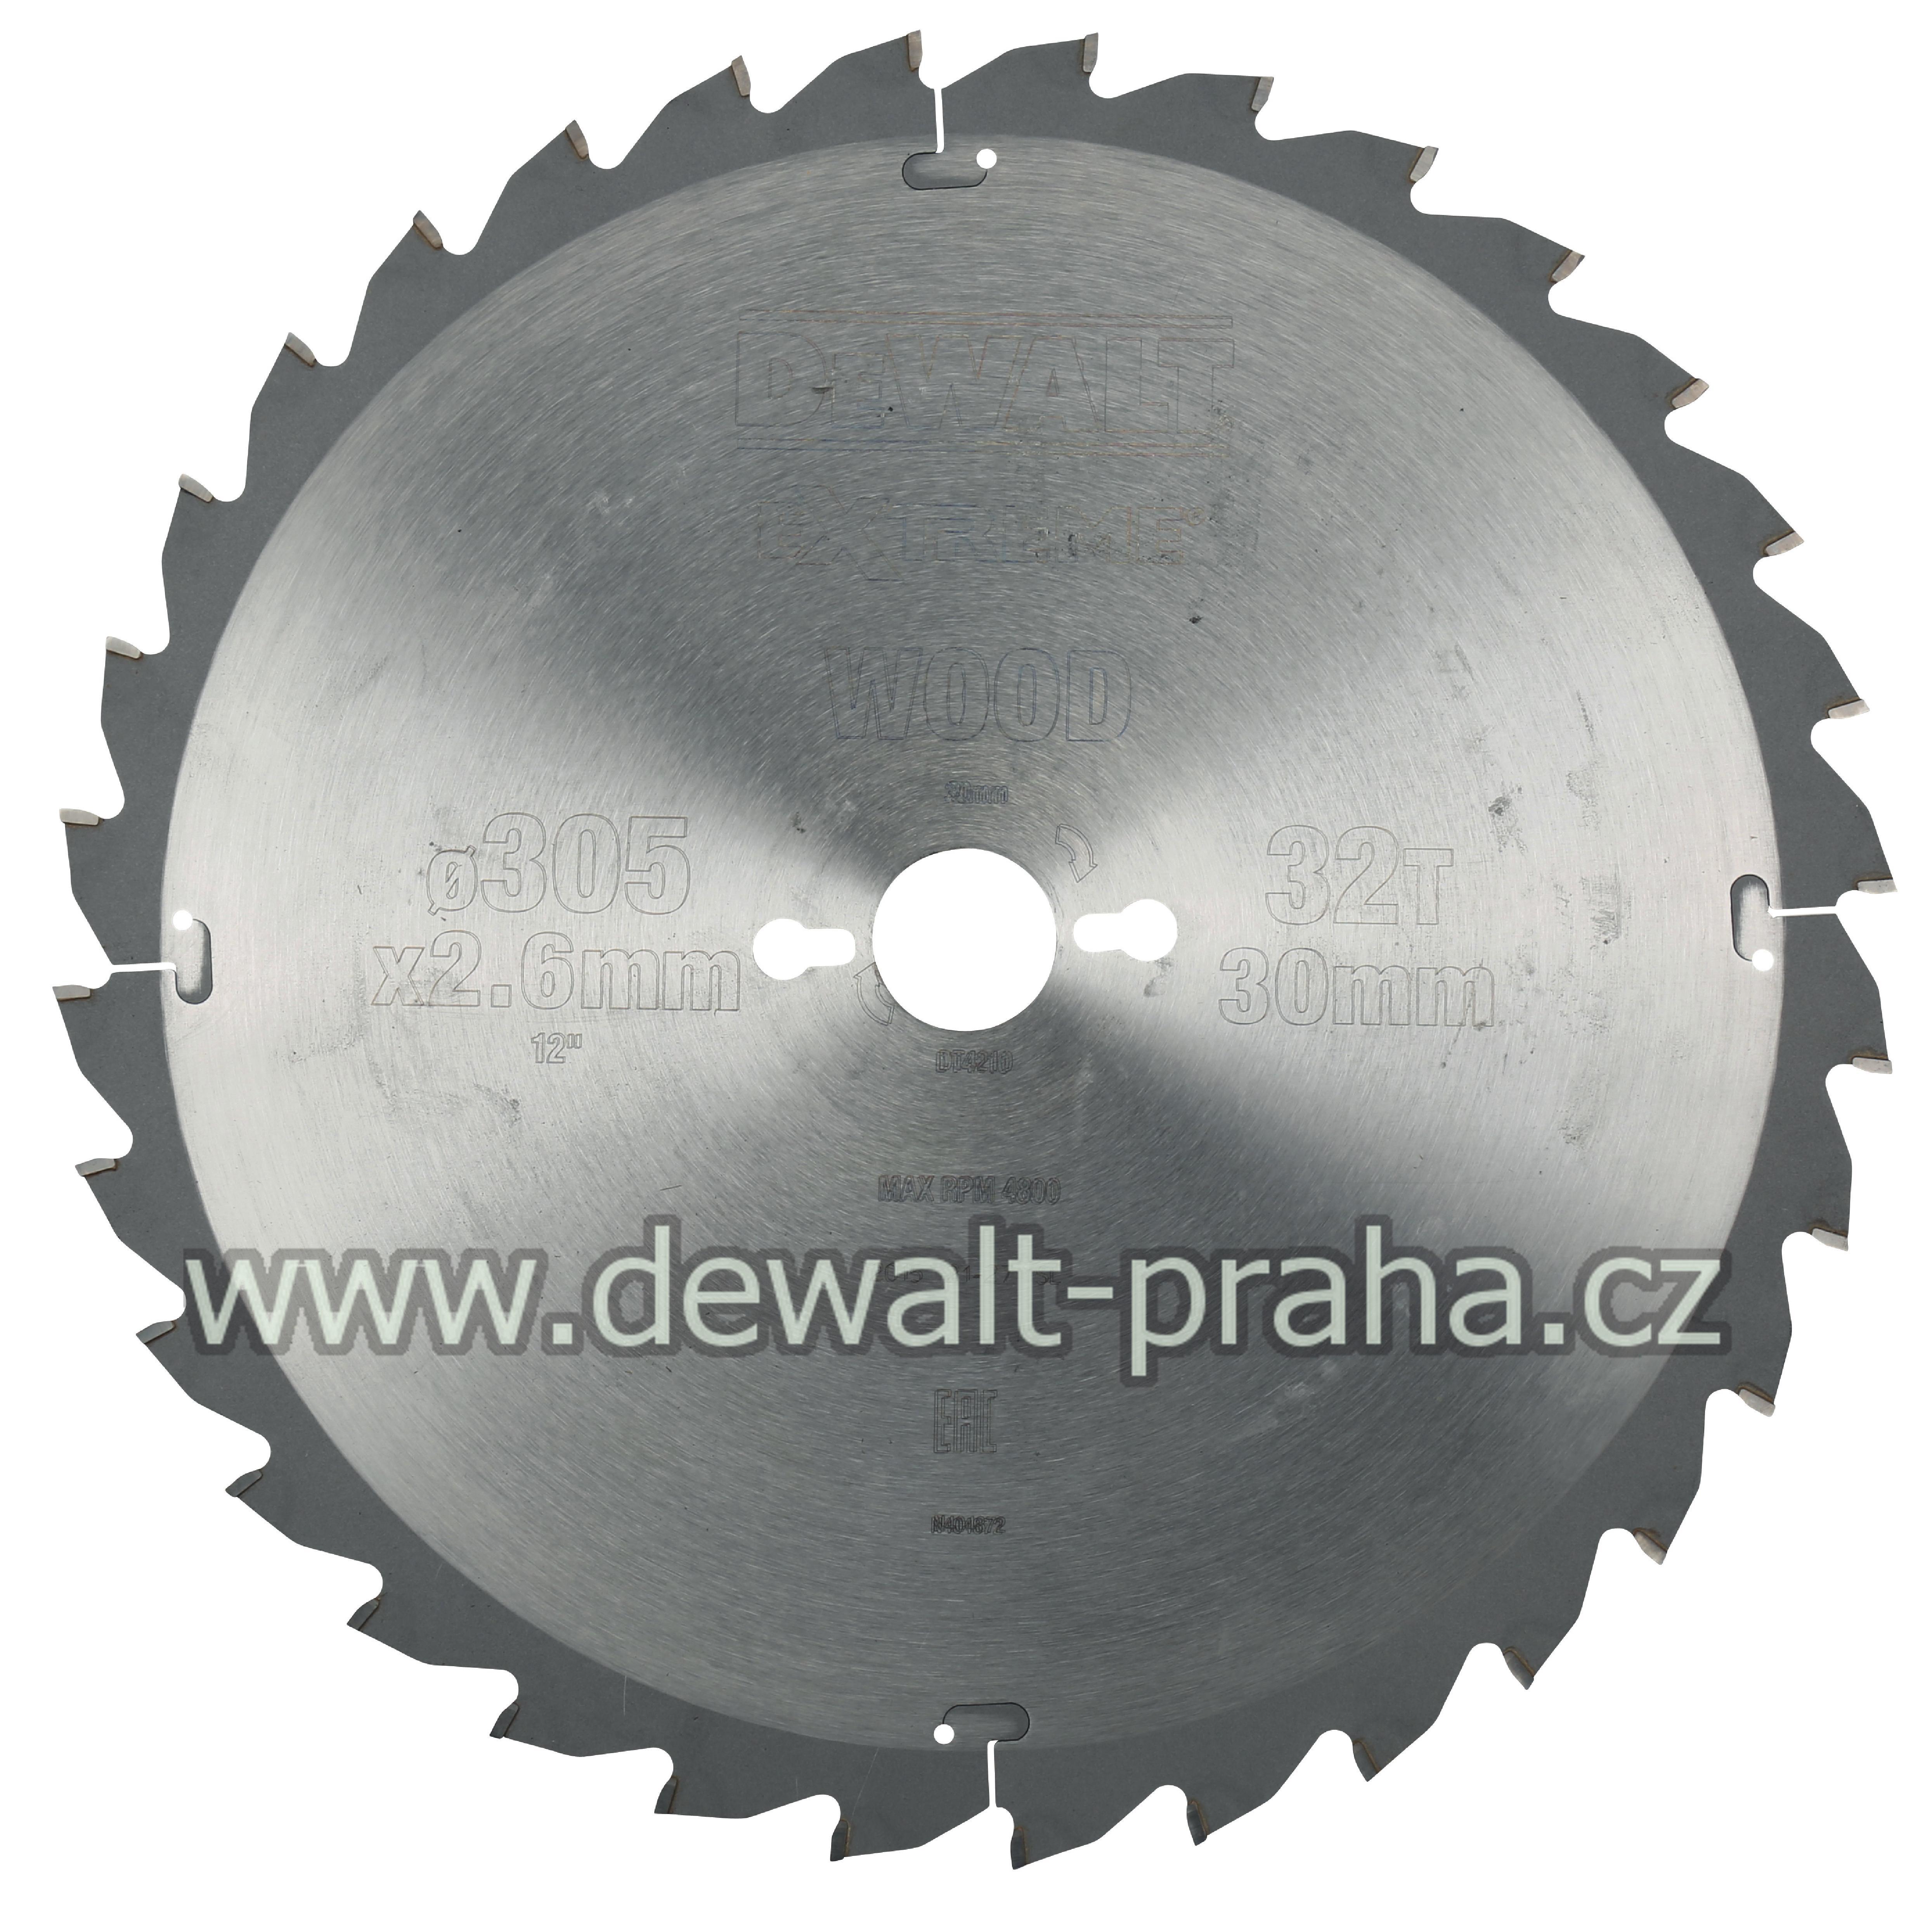 DT4210 DeWALT Pilový kotouč 305x30mm, 32 zubů